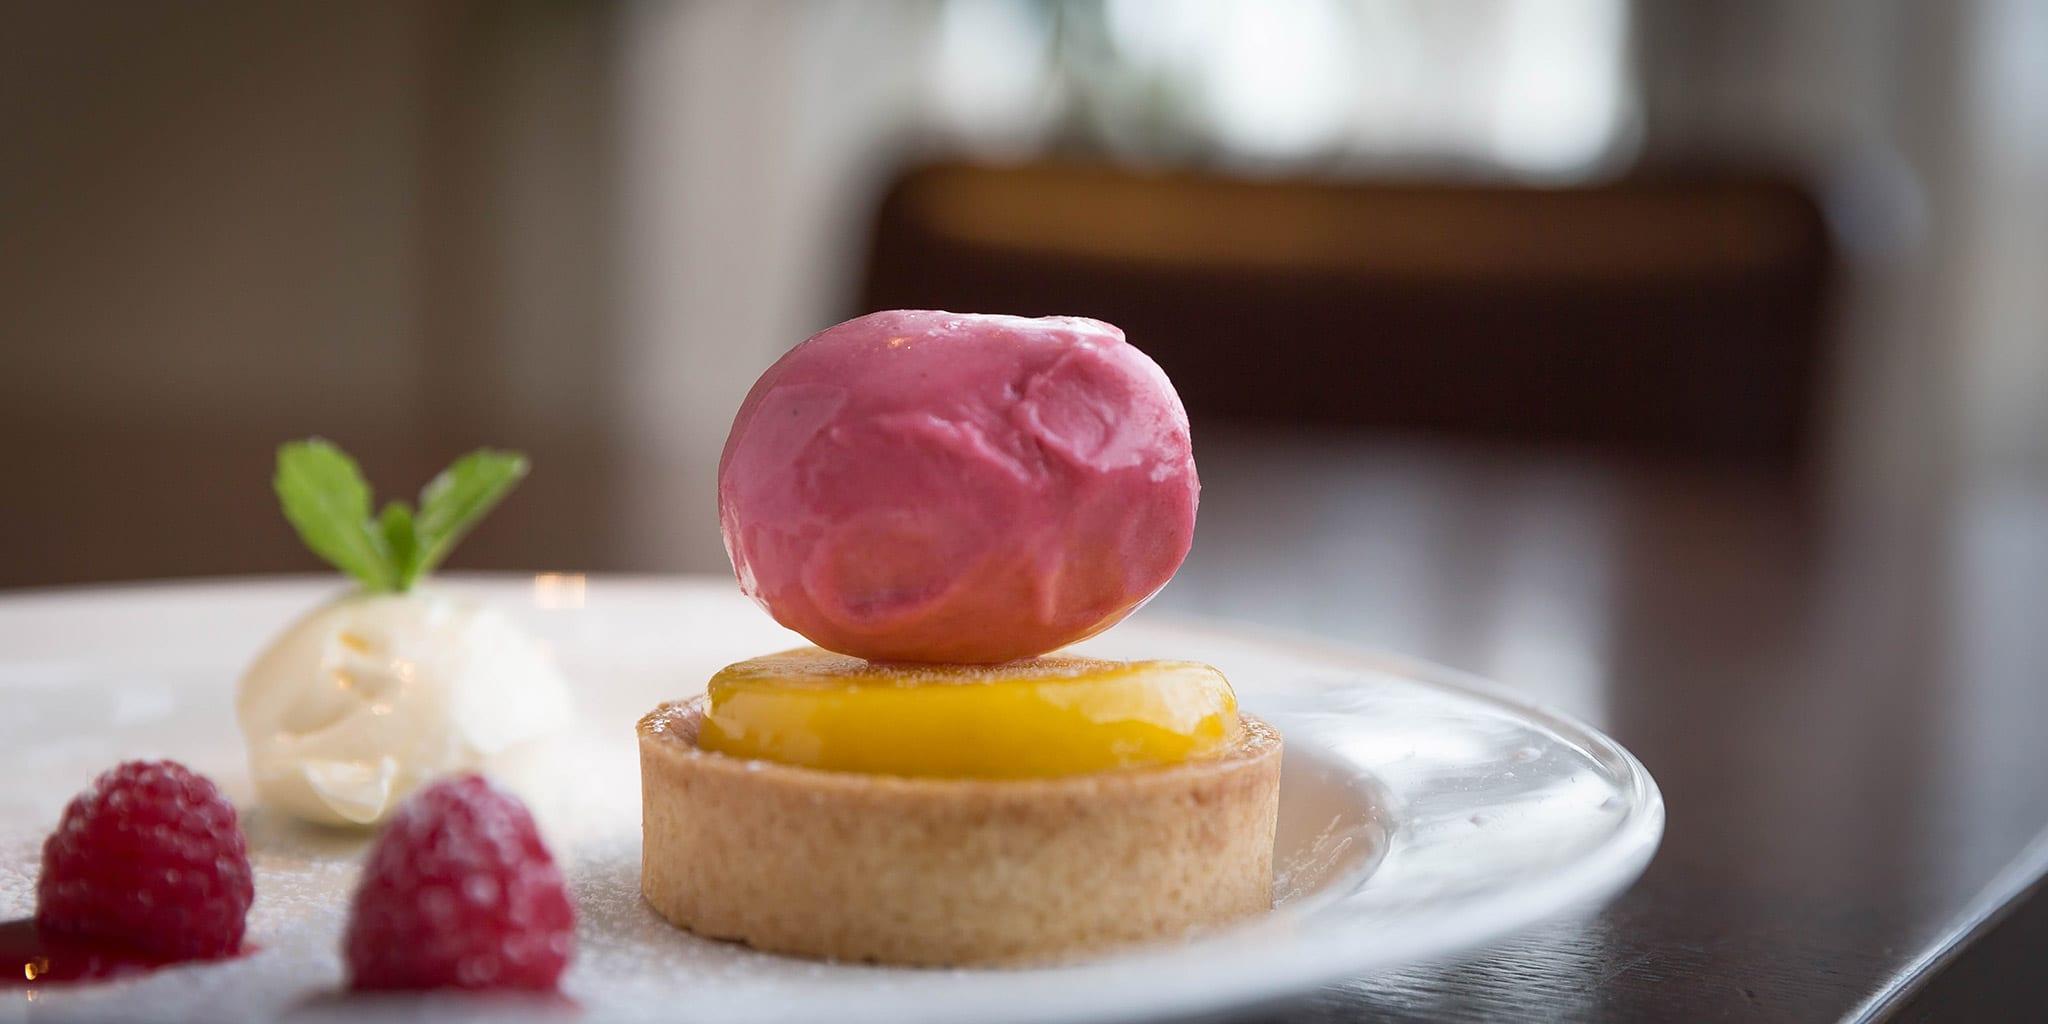 Lemon-Dessert-Clayton